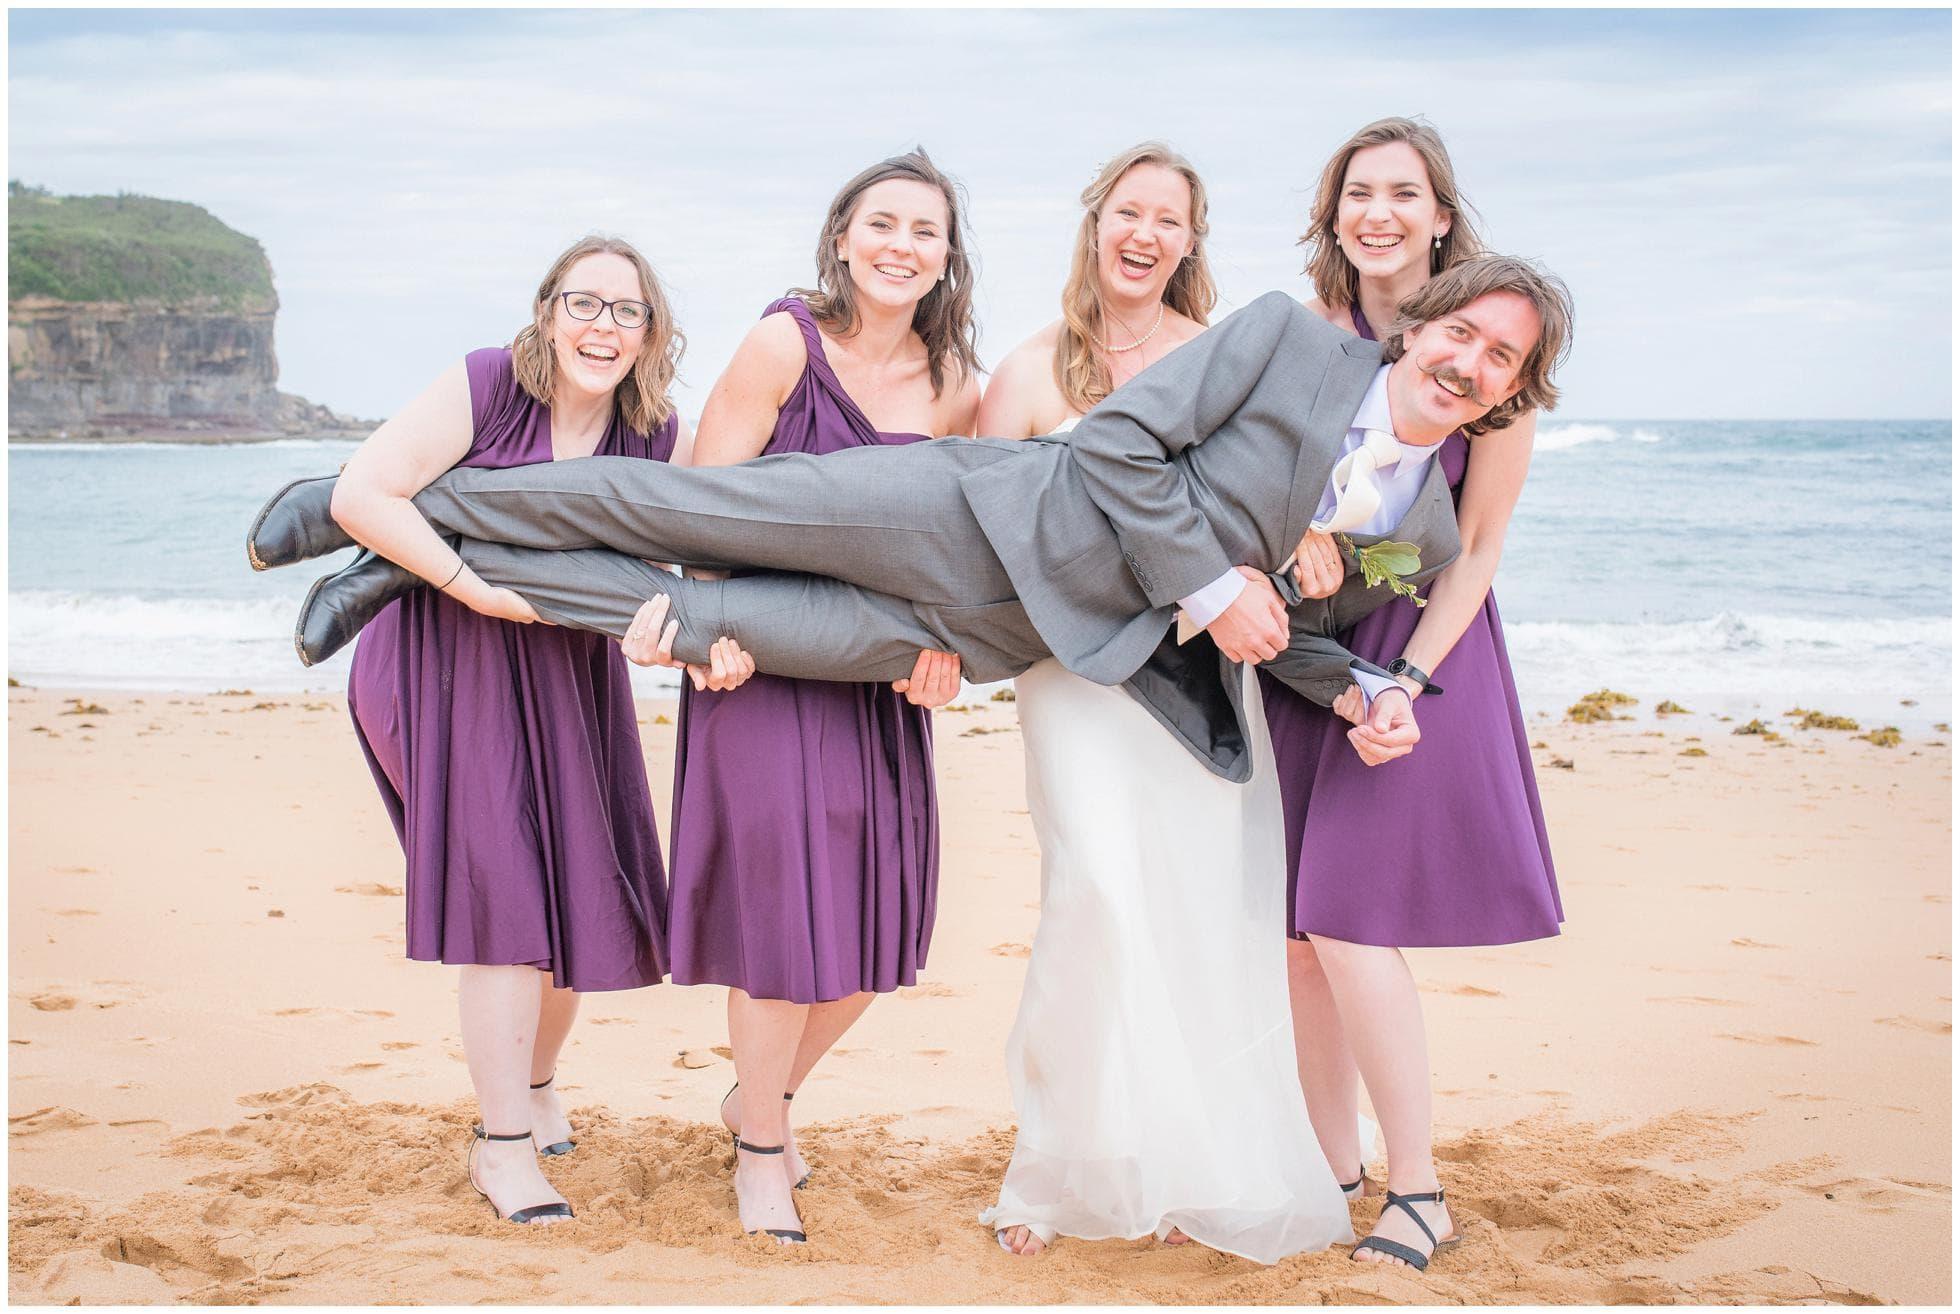 Bridesmaids holding up the groom on Mona Vale beach. Fun wedding photography!